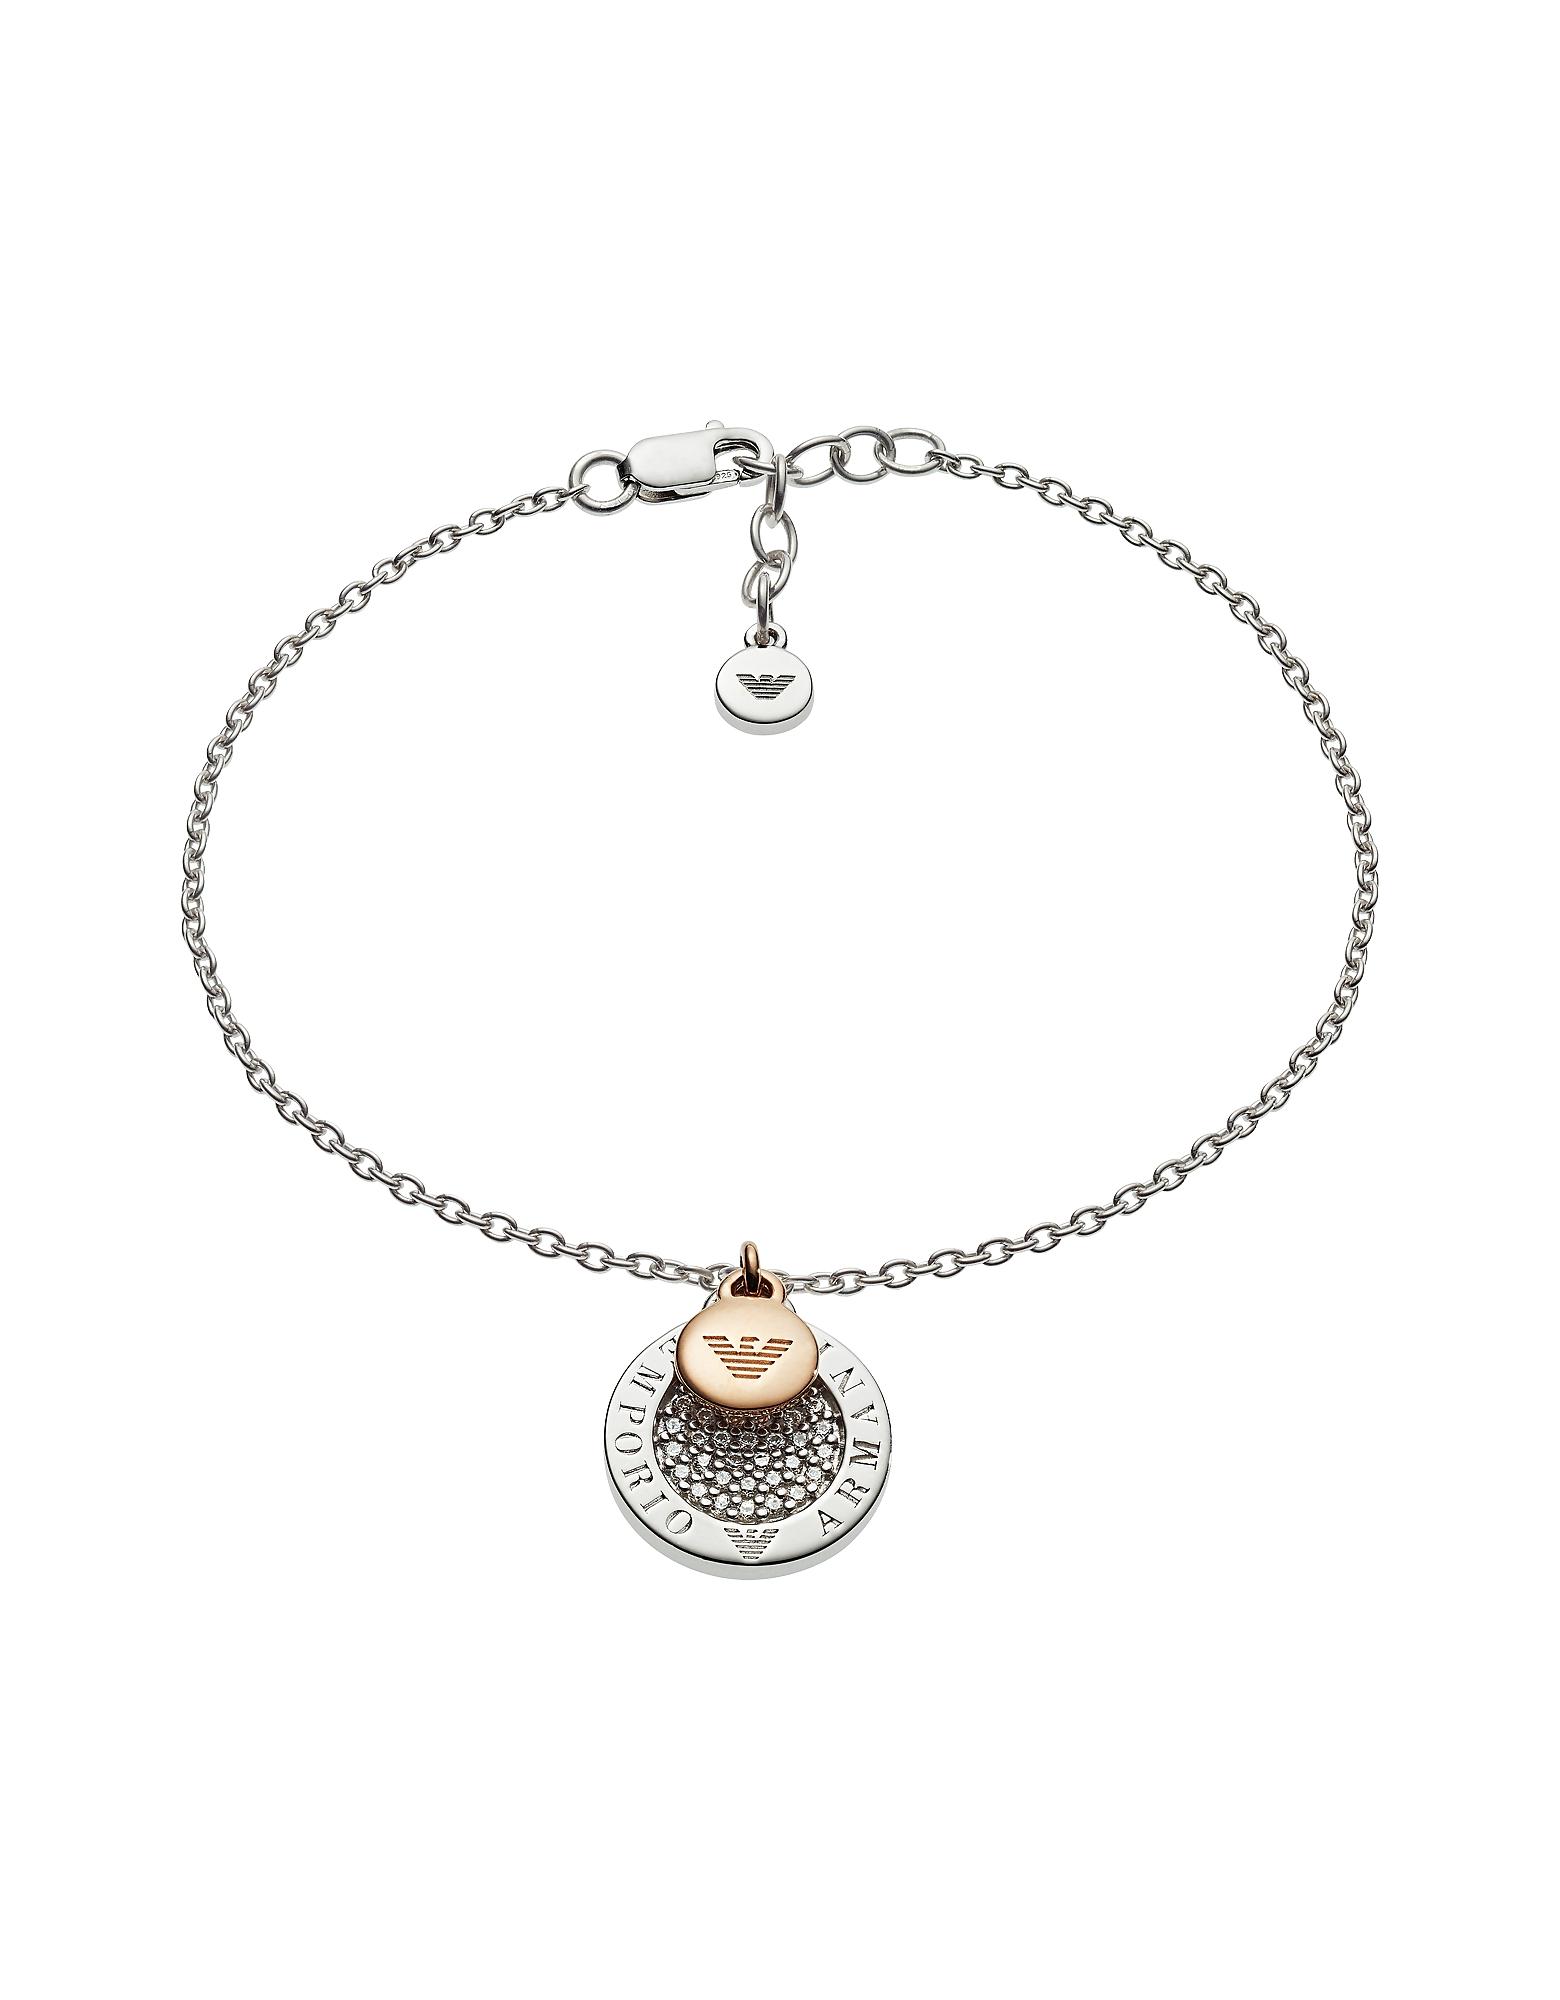 Emporio Armani Designer Bracelets, Two-Tone Signature Bracelet